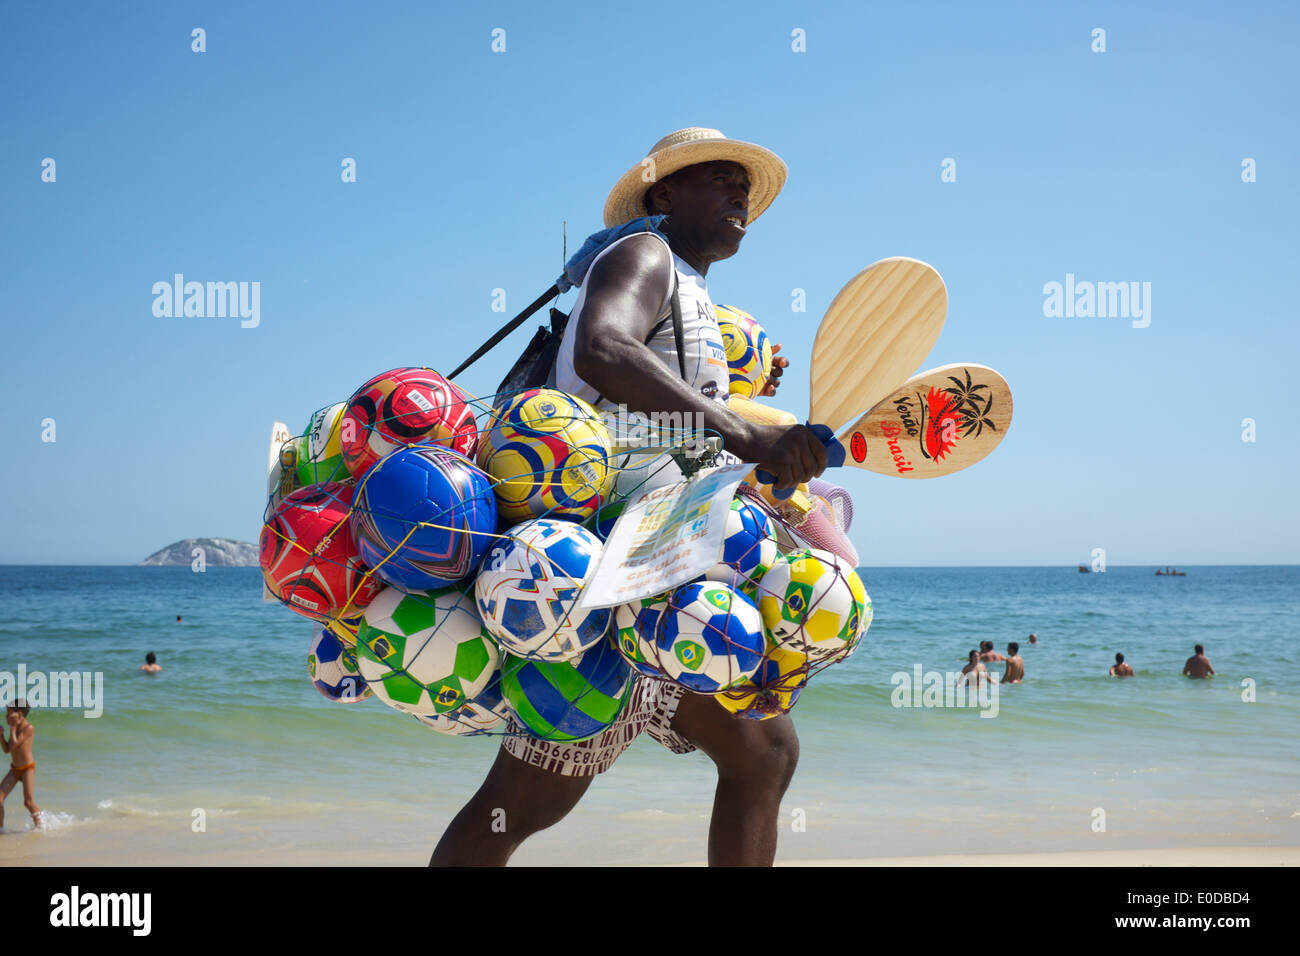 Pelotas De Playa Imágenes De Stock   Pelotas De Playa Fotos De Stock ... 052bc86762ec4